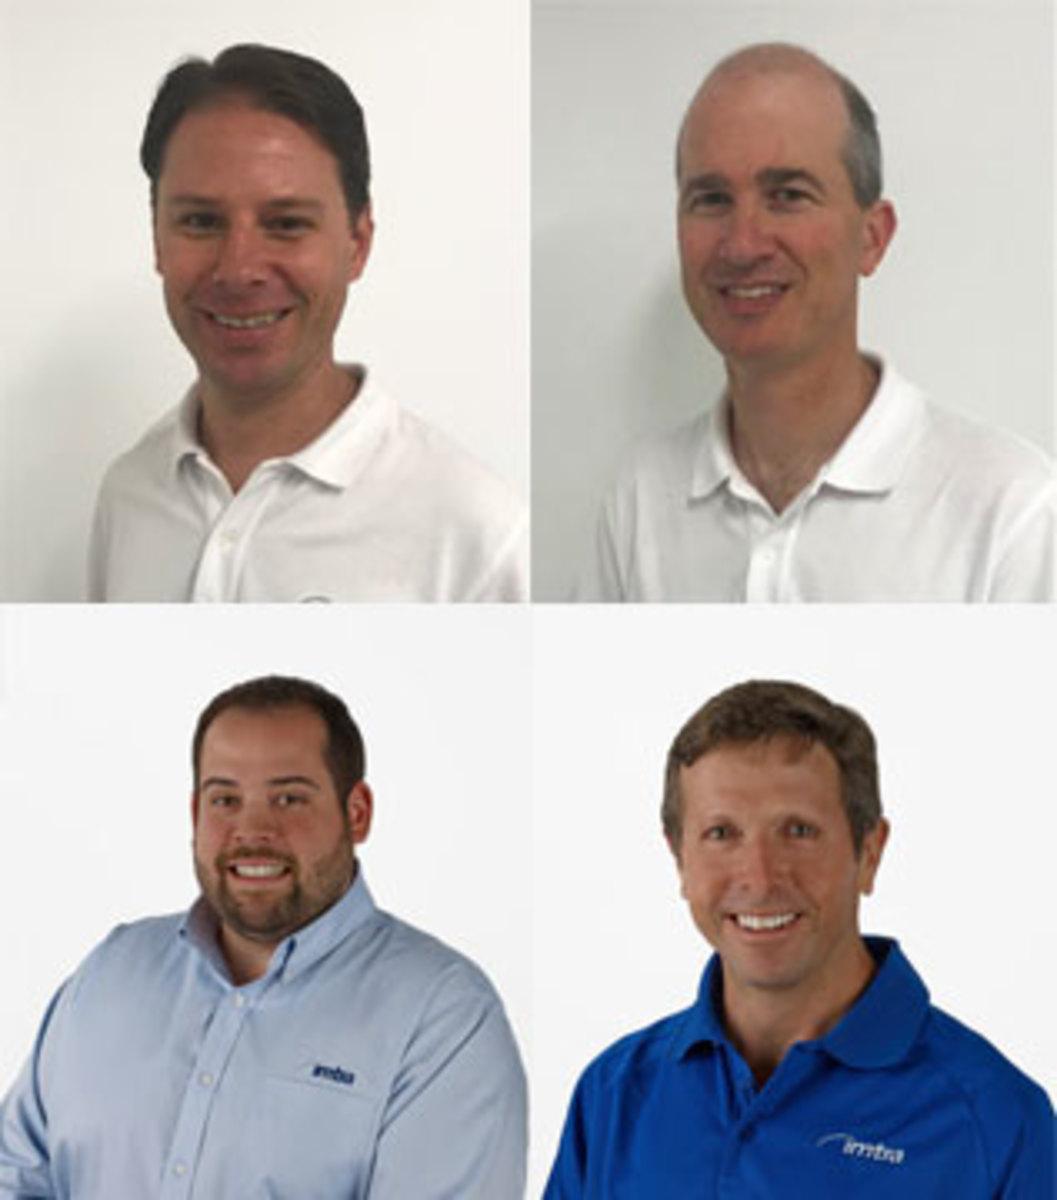 (Clockwise from top left) Brad Norton, Van Noorden, Kinder Woodcock and Nate Cabral.